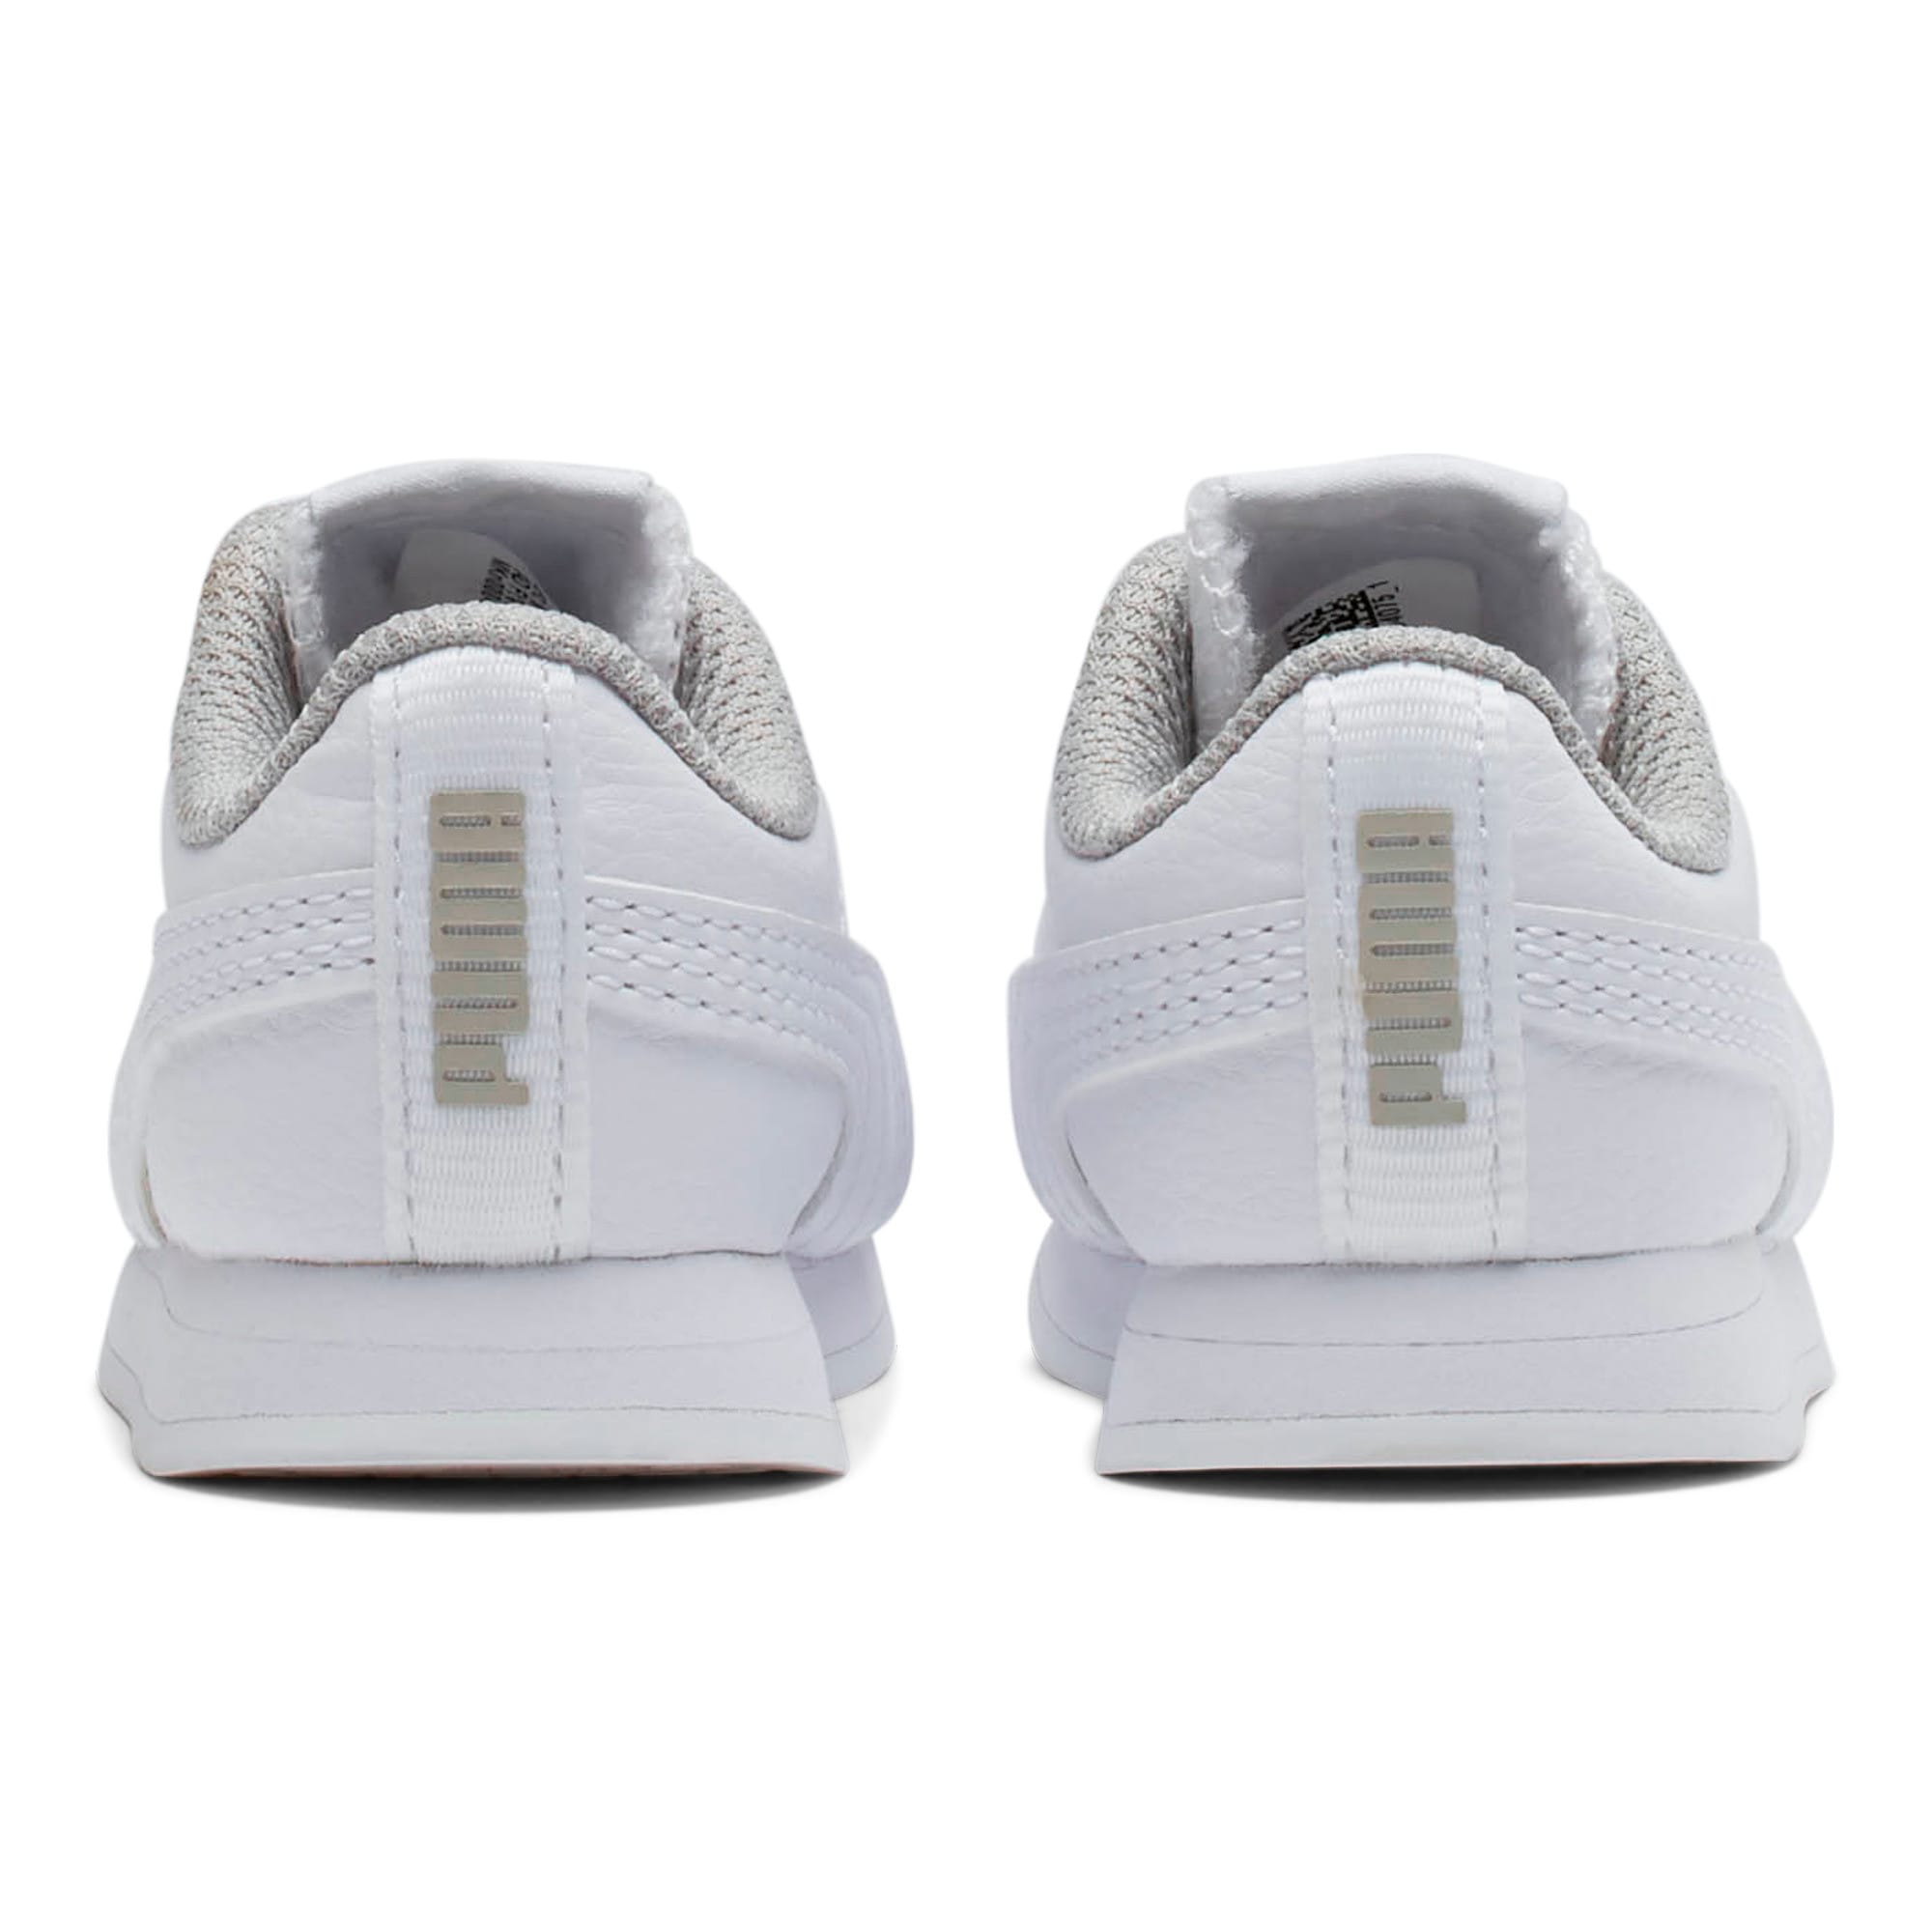 Thumbnail 3 of Turin II AC Toddler Shoes, Puma White-Puma White, medium